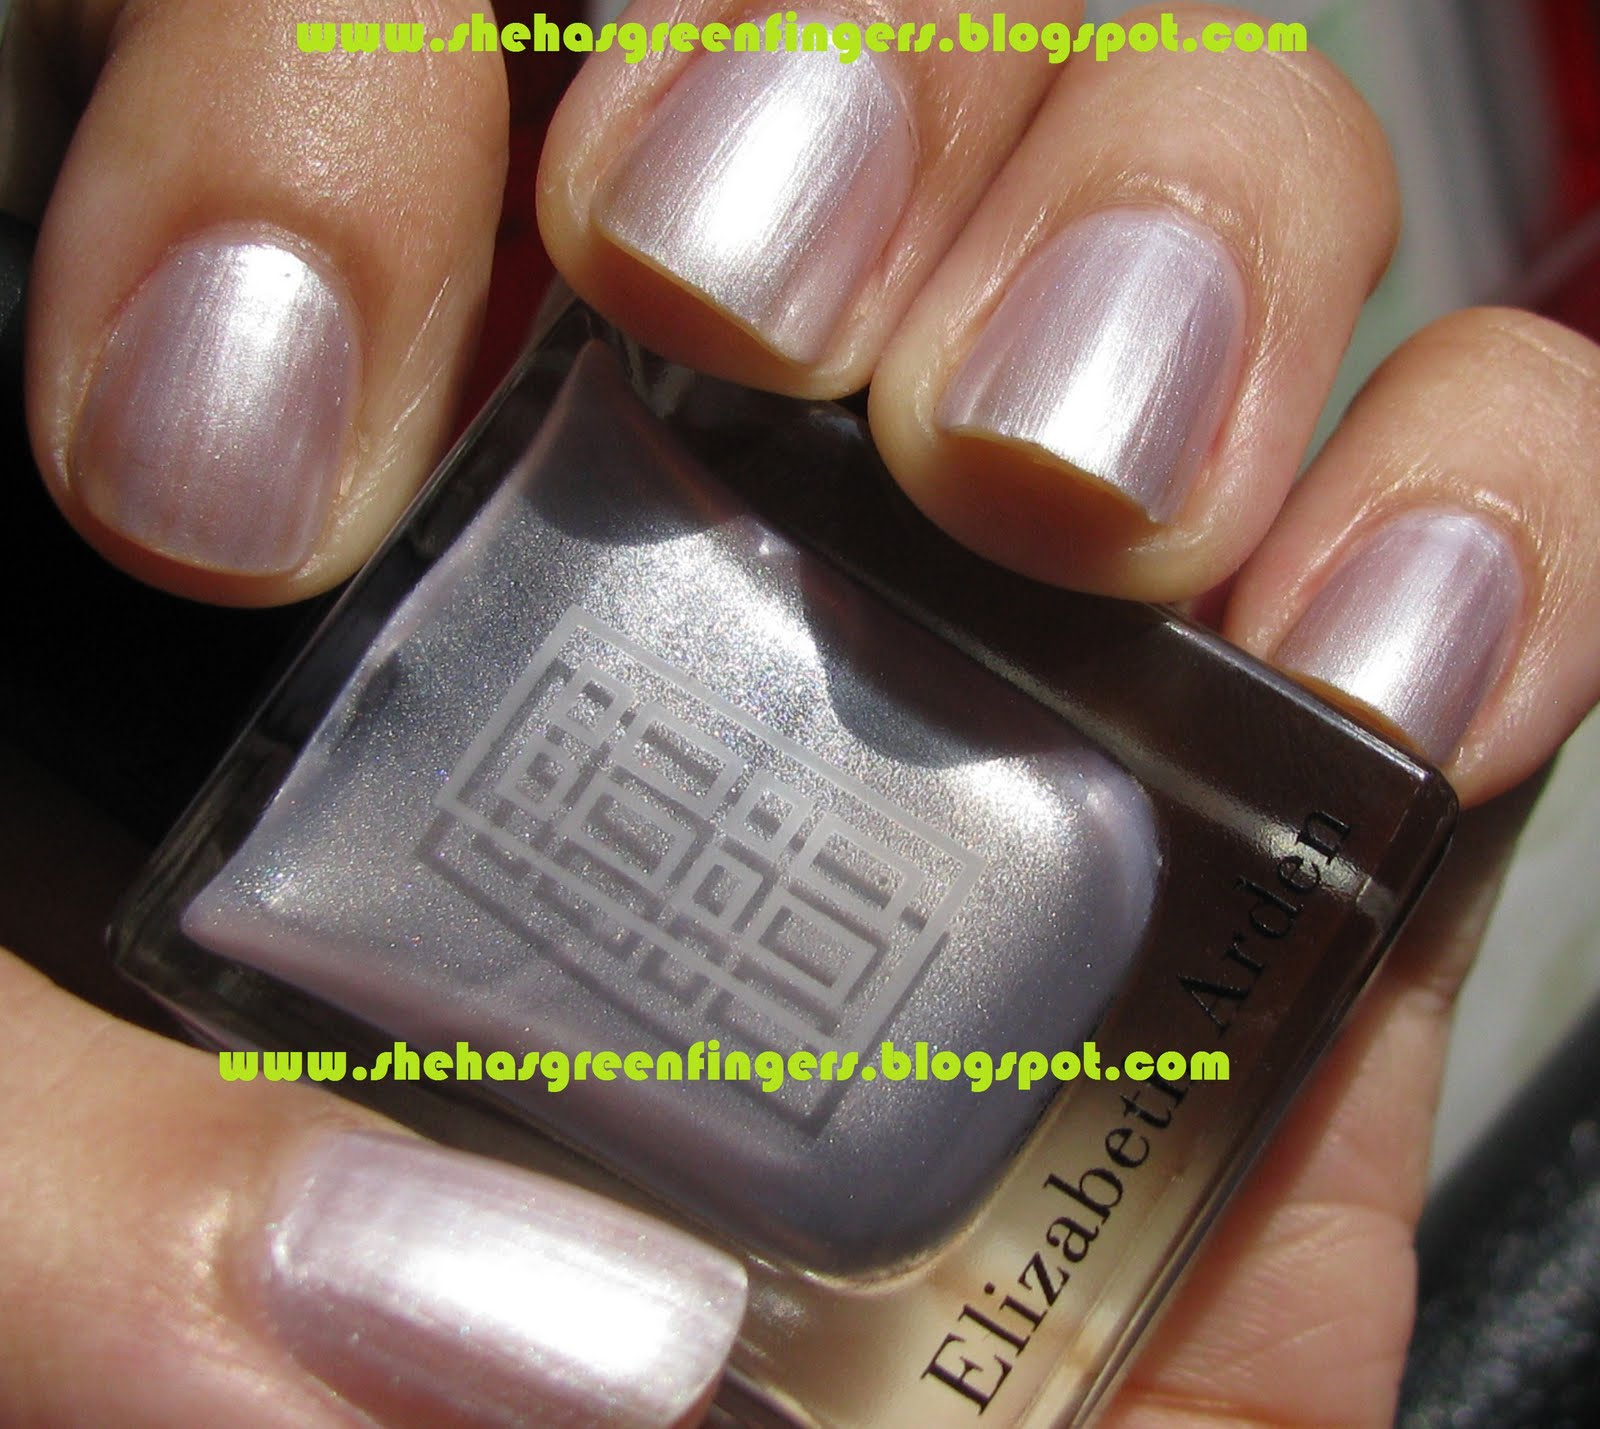 She Has Green Fingers: Mayfair Lilac F by Elizabeth Arden